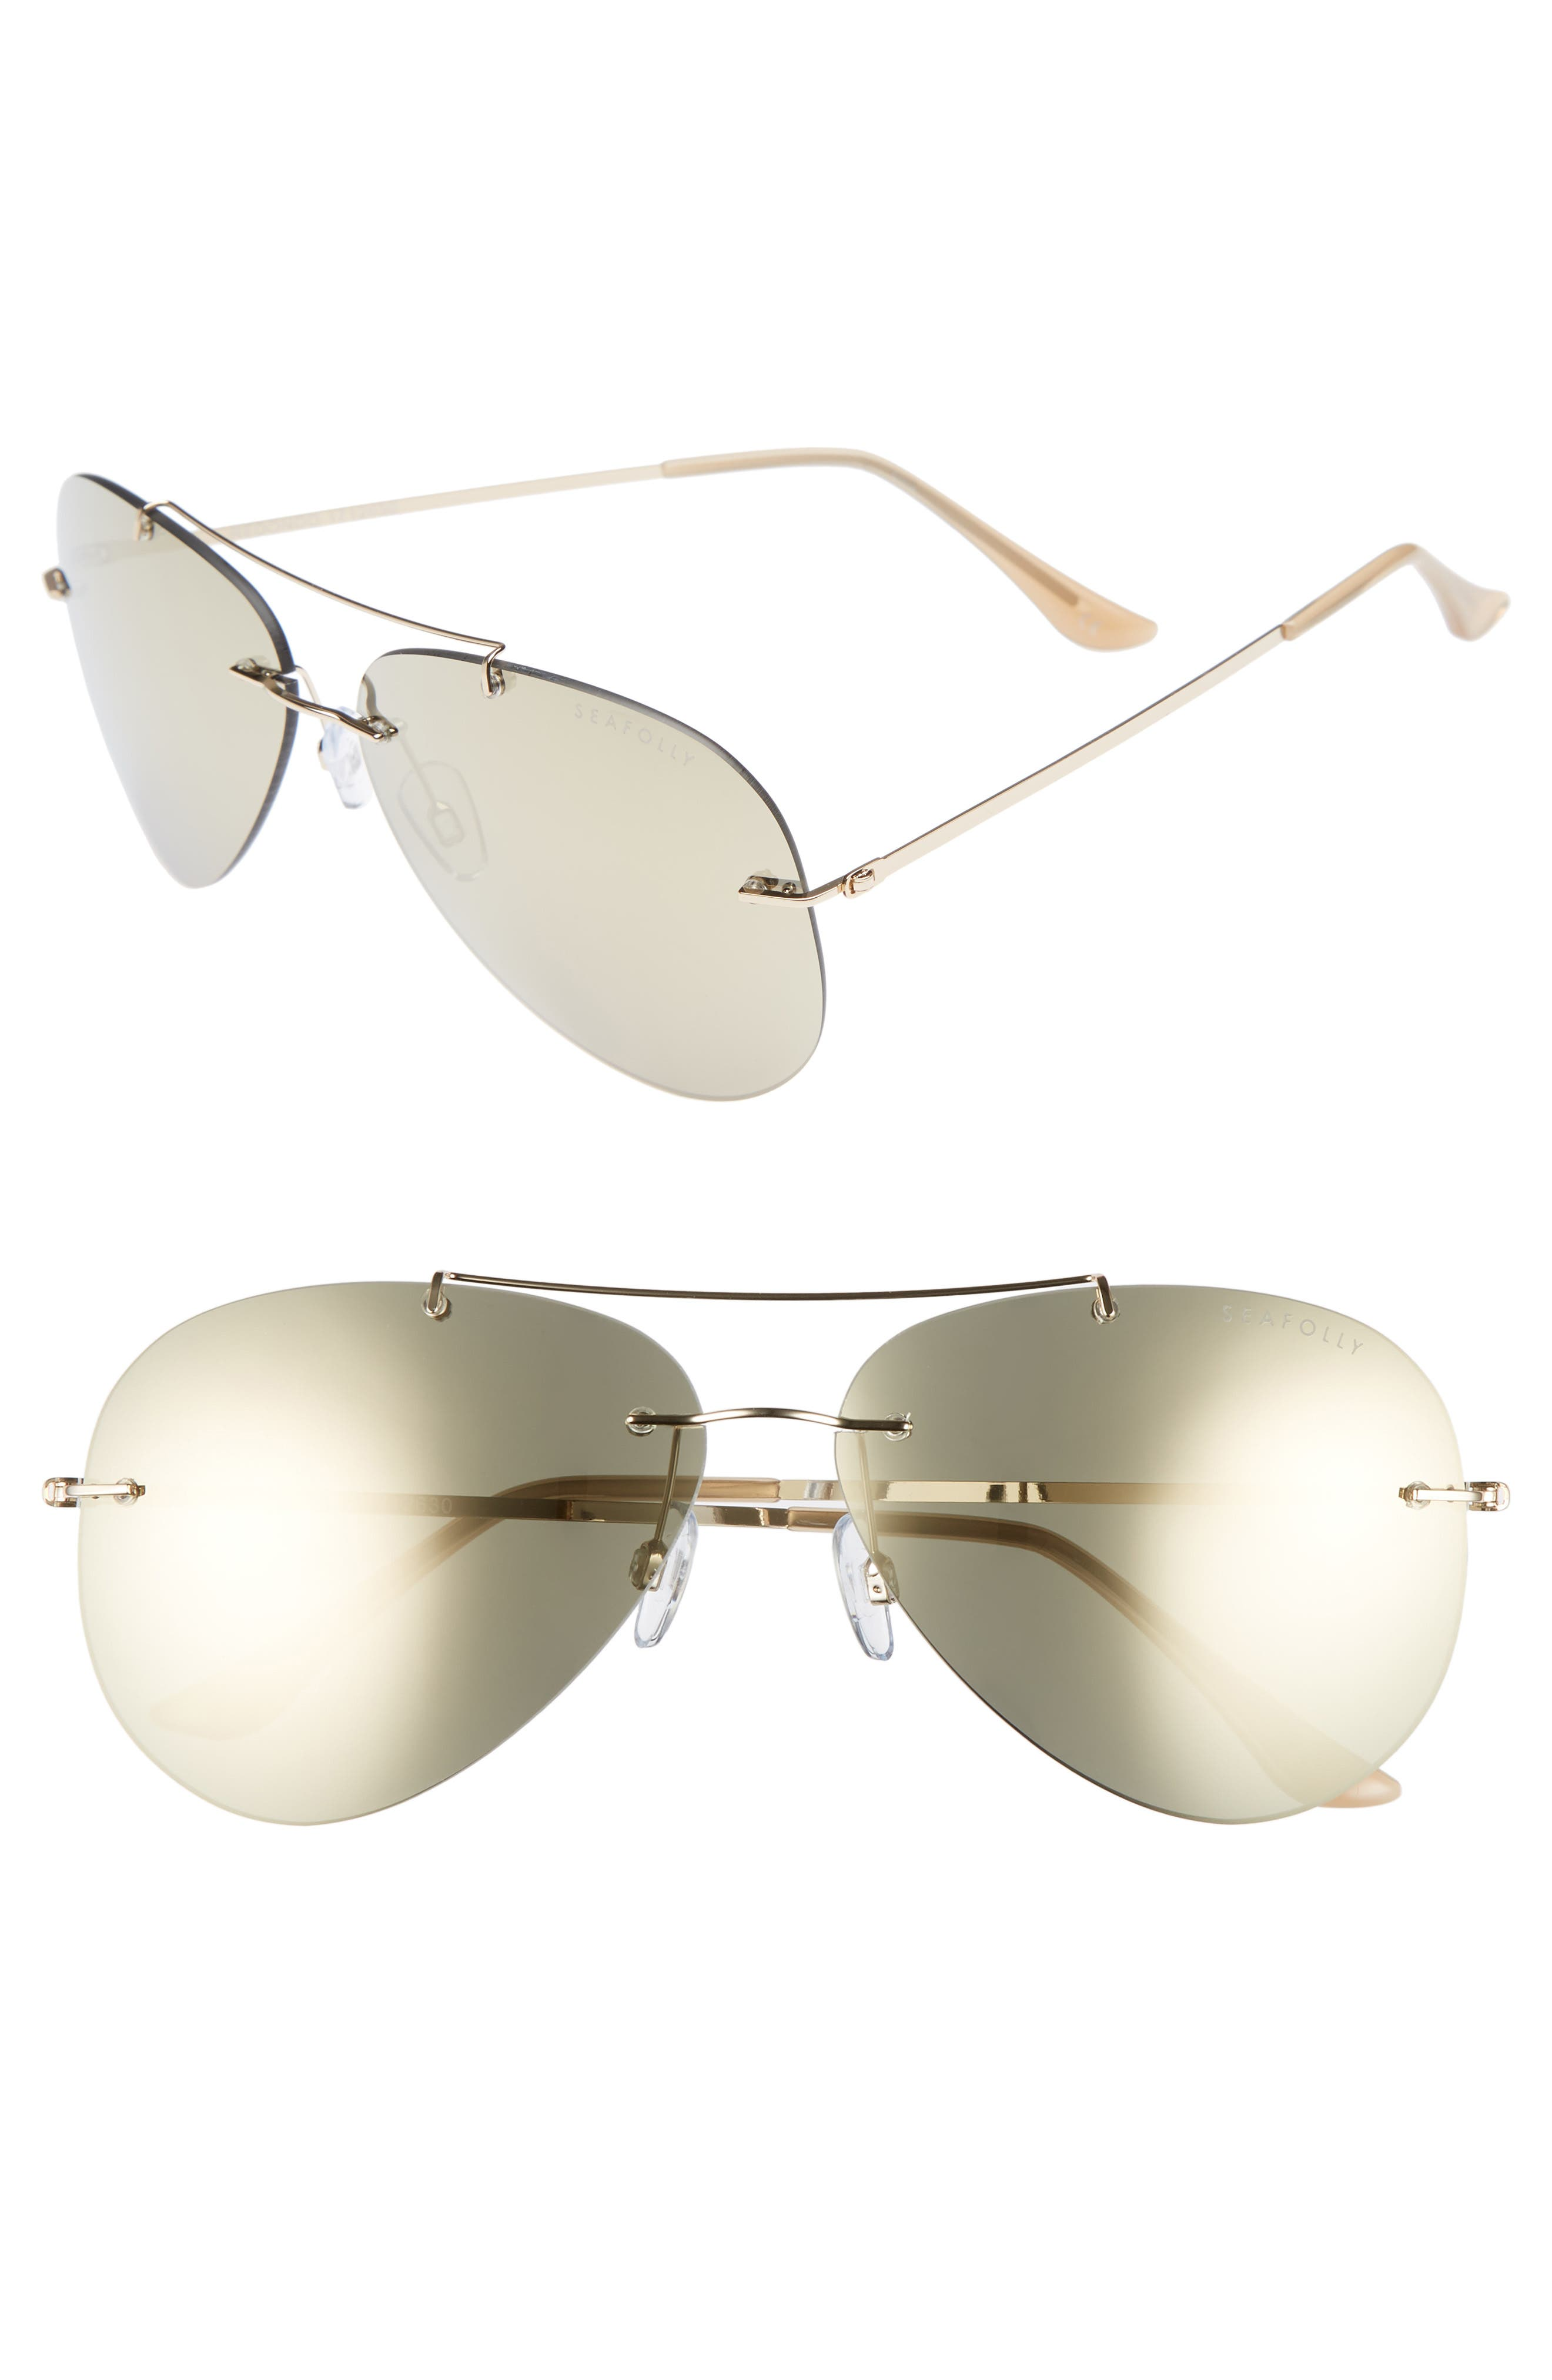 SEAFOLLY Redondo 61mm Rimless Aviator Sunglasses, Main, color, 710